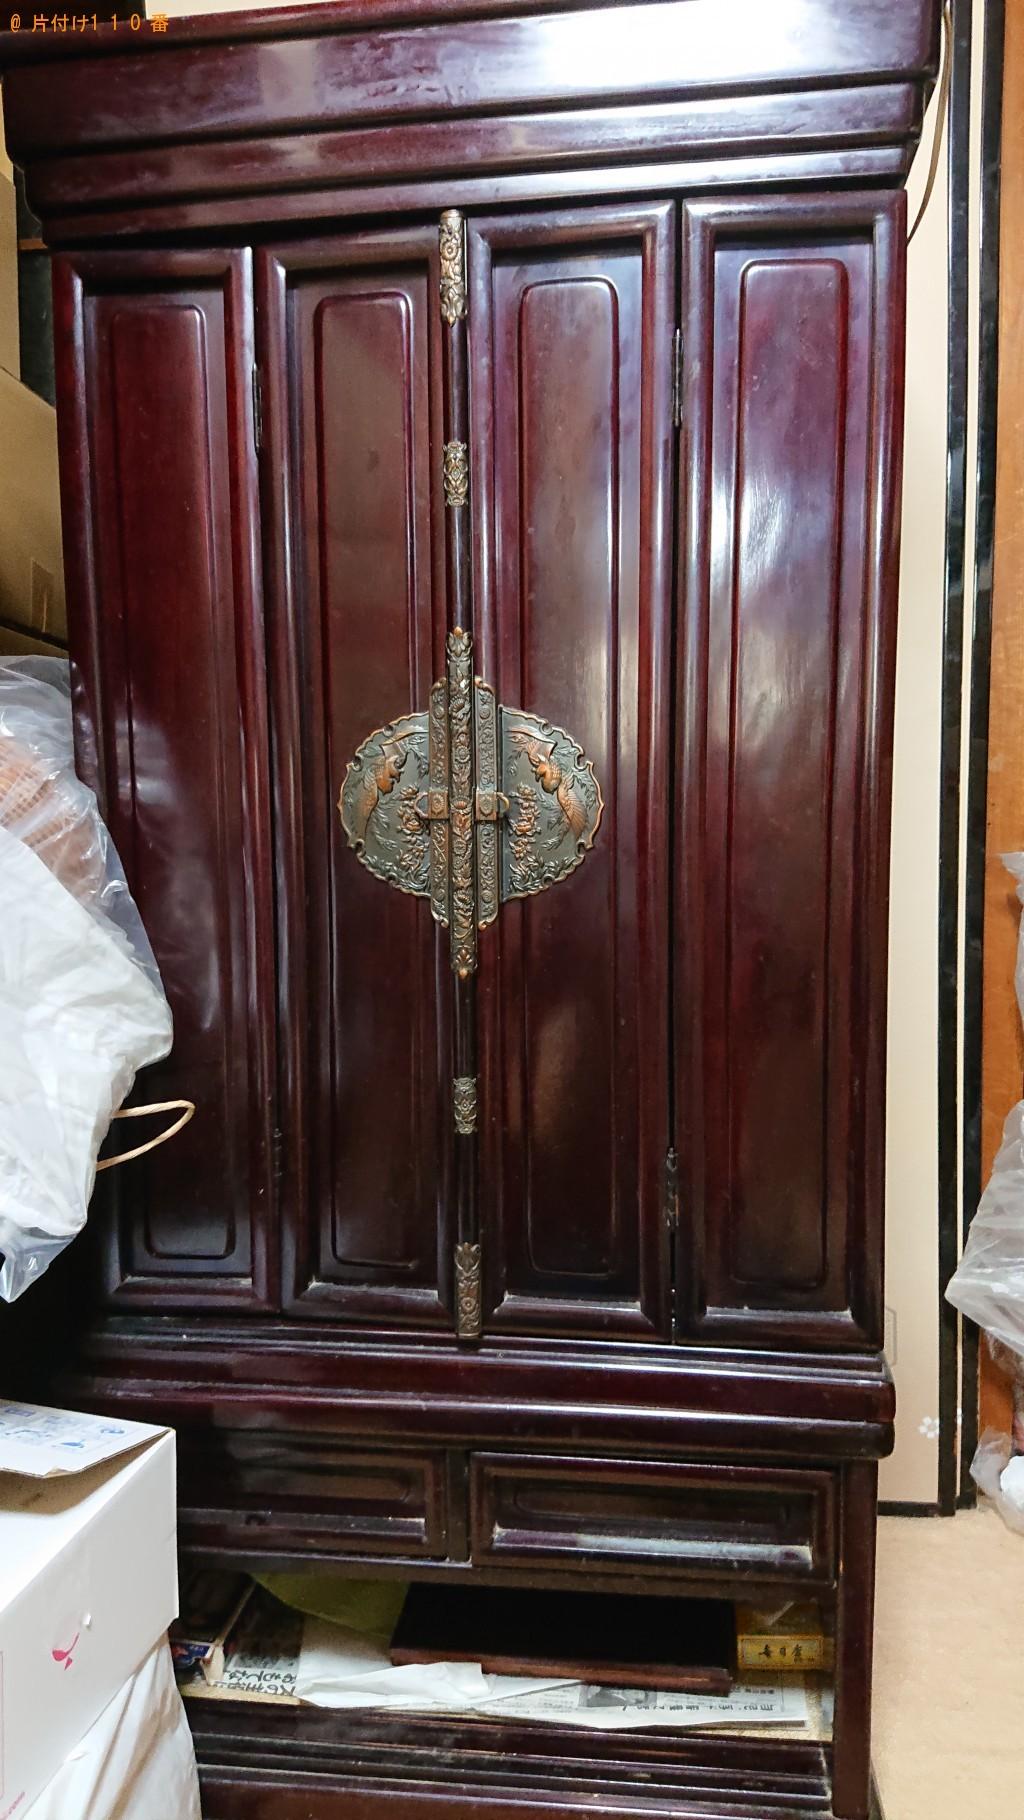 【京都市伏見区】仏壇の回収・処分 お客様の声